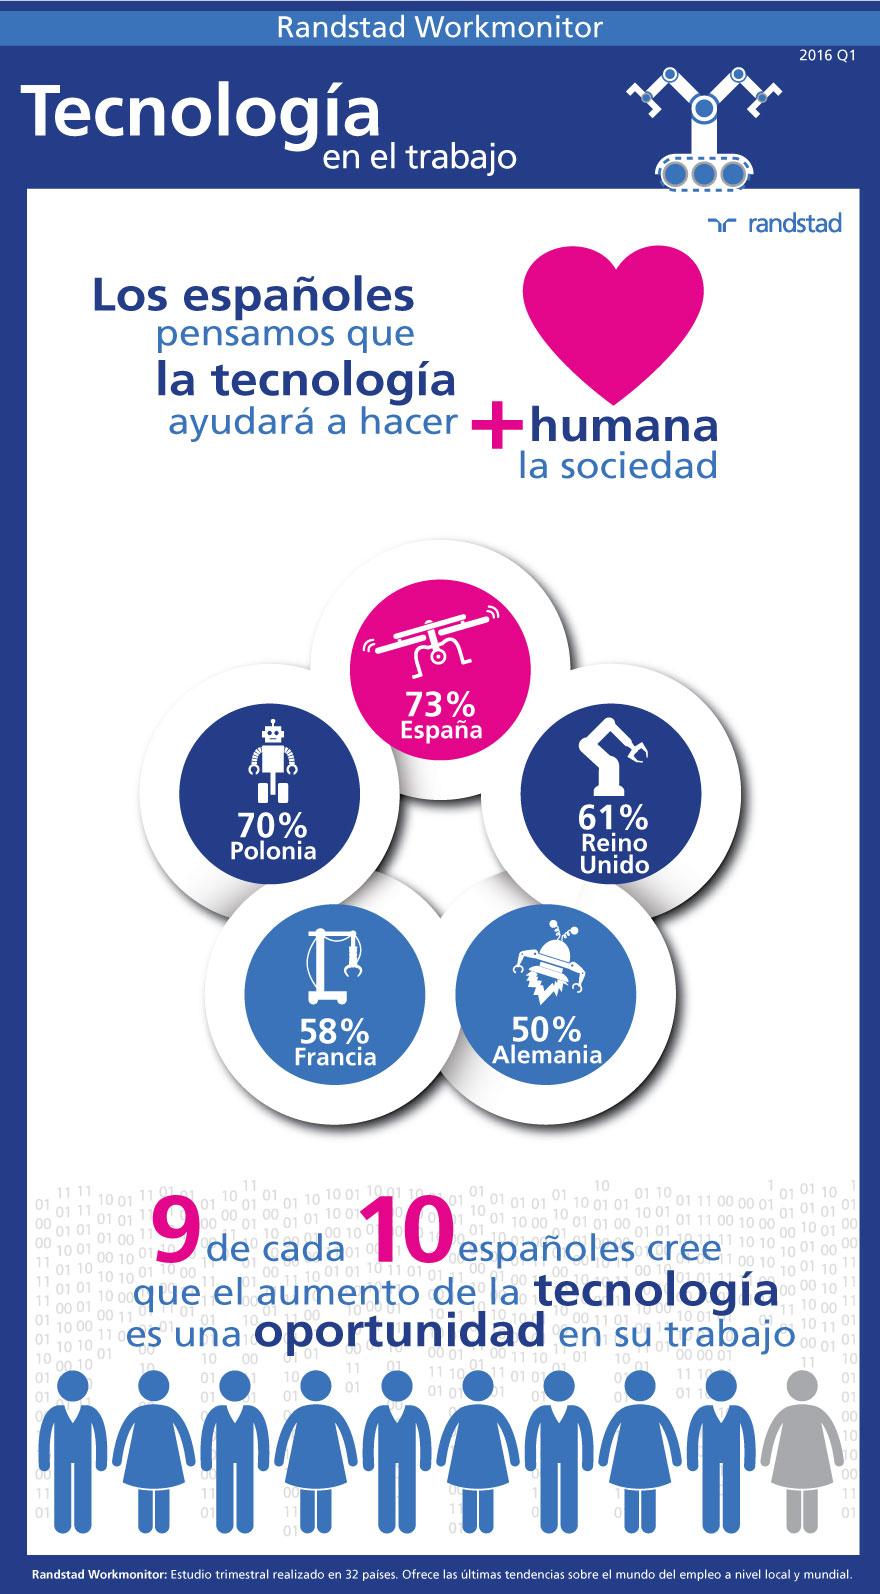 infografia-tecnologia-en-el-trabajo-randstad-workmonitor-q1-2016.jpg